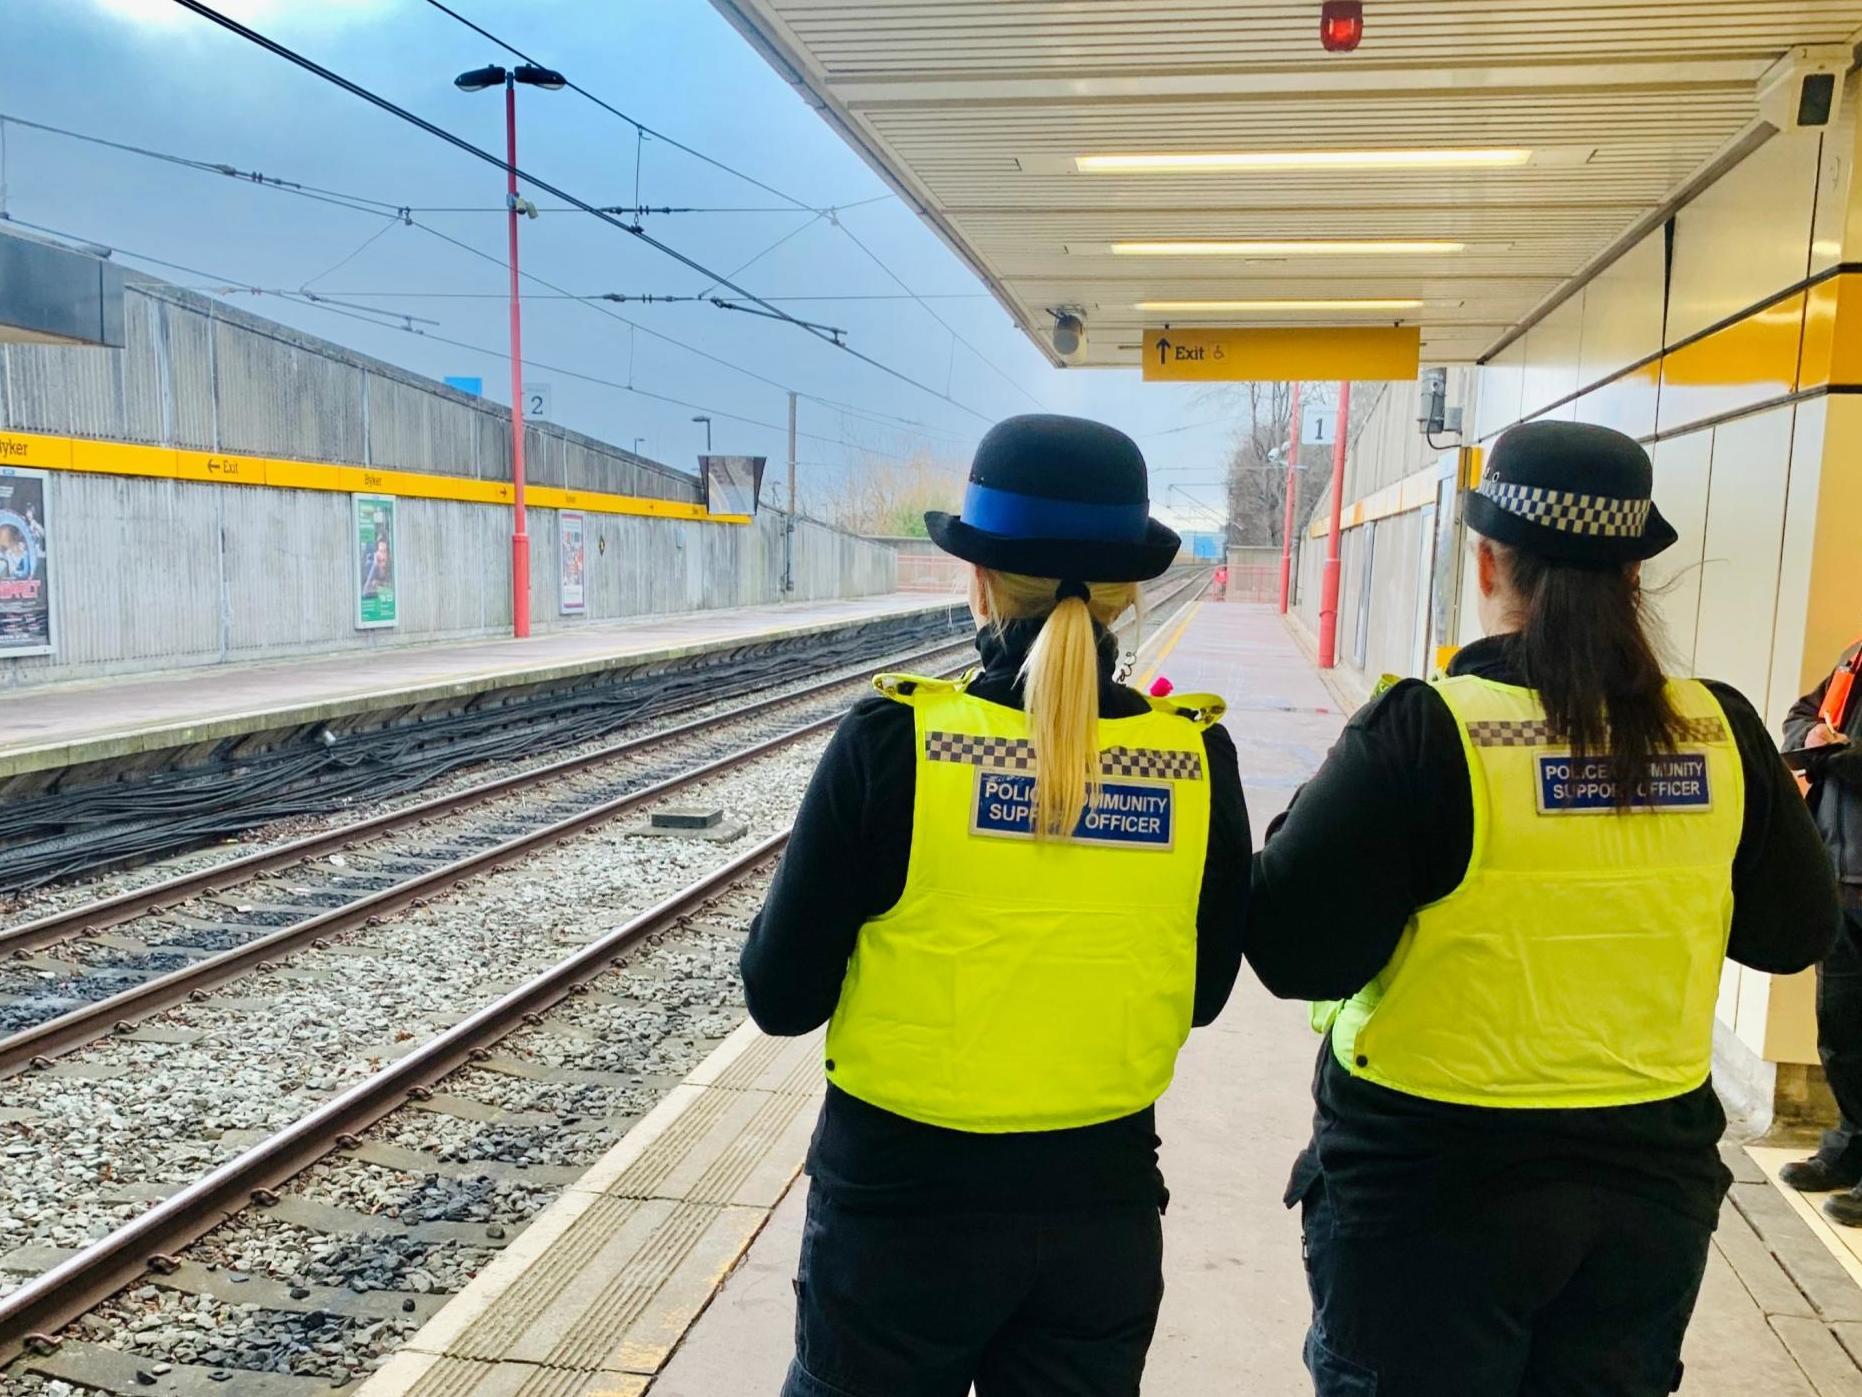 Newcastle train attack: Thirteen children arrested after boy assaulted